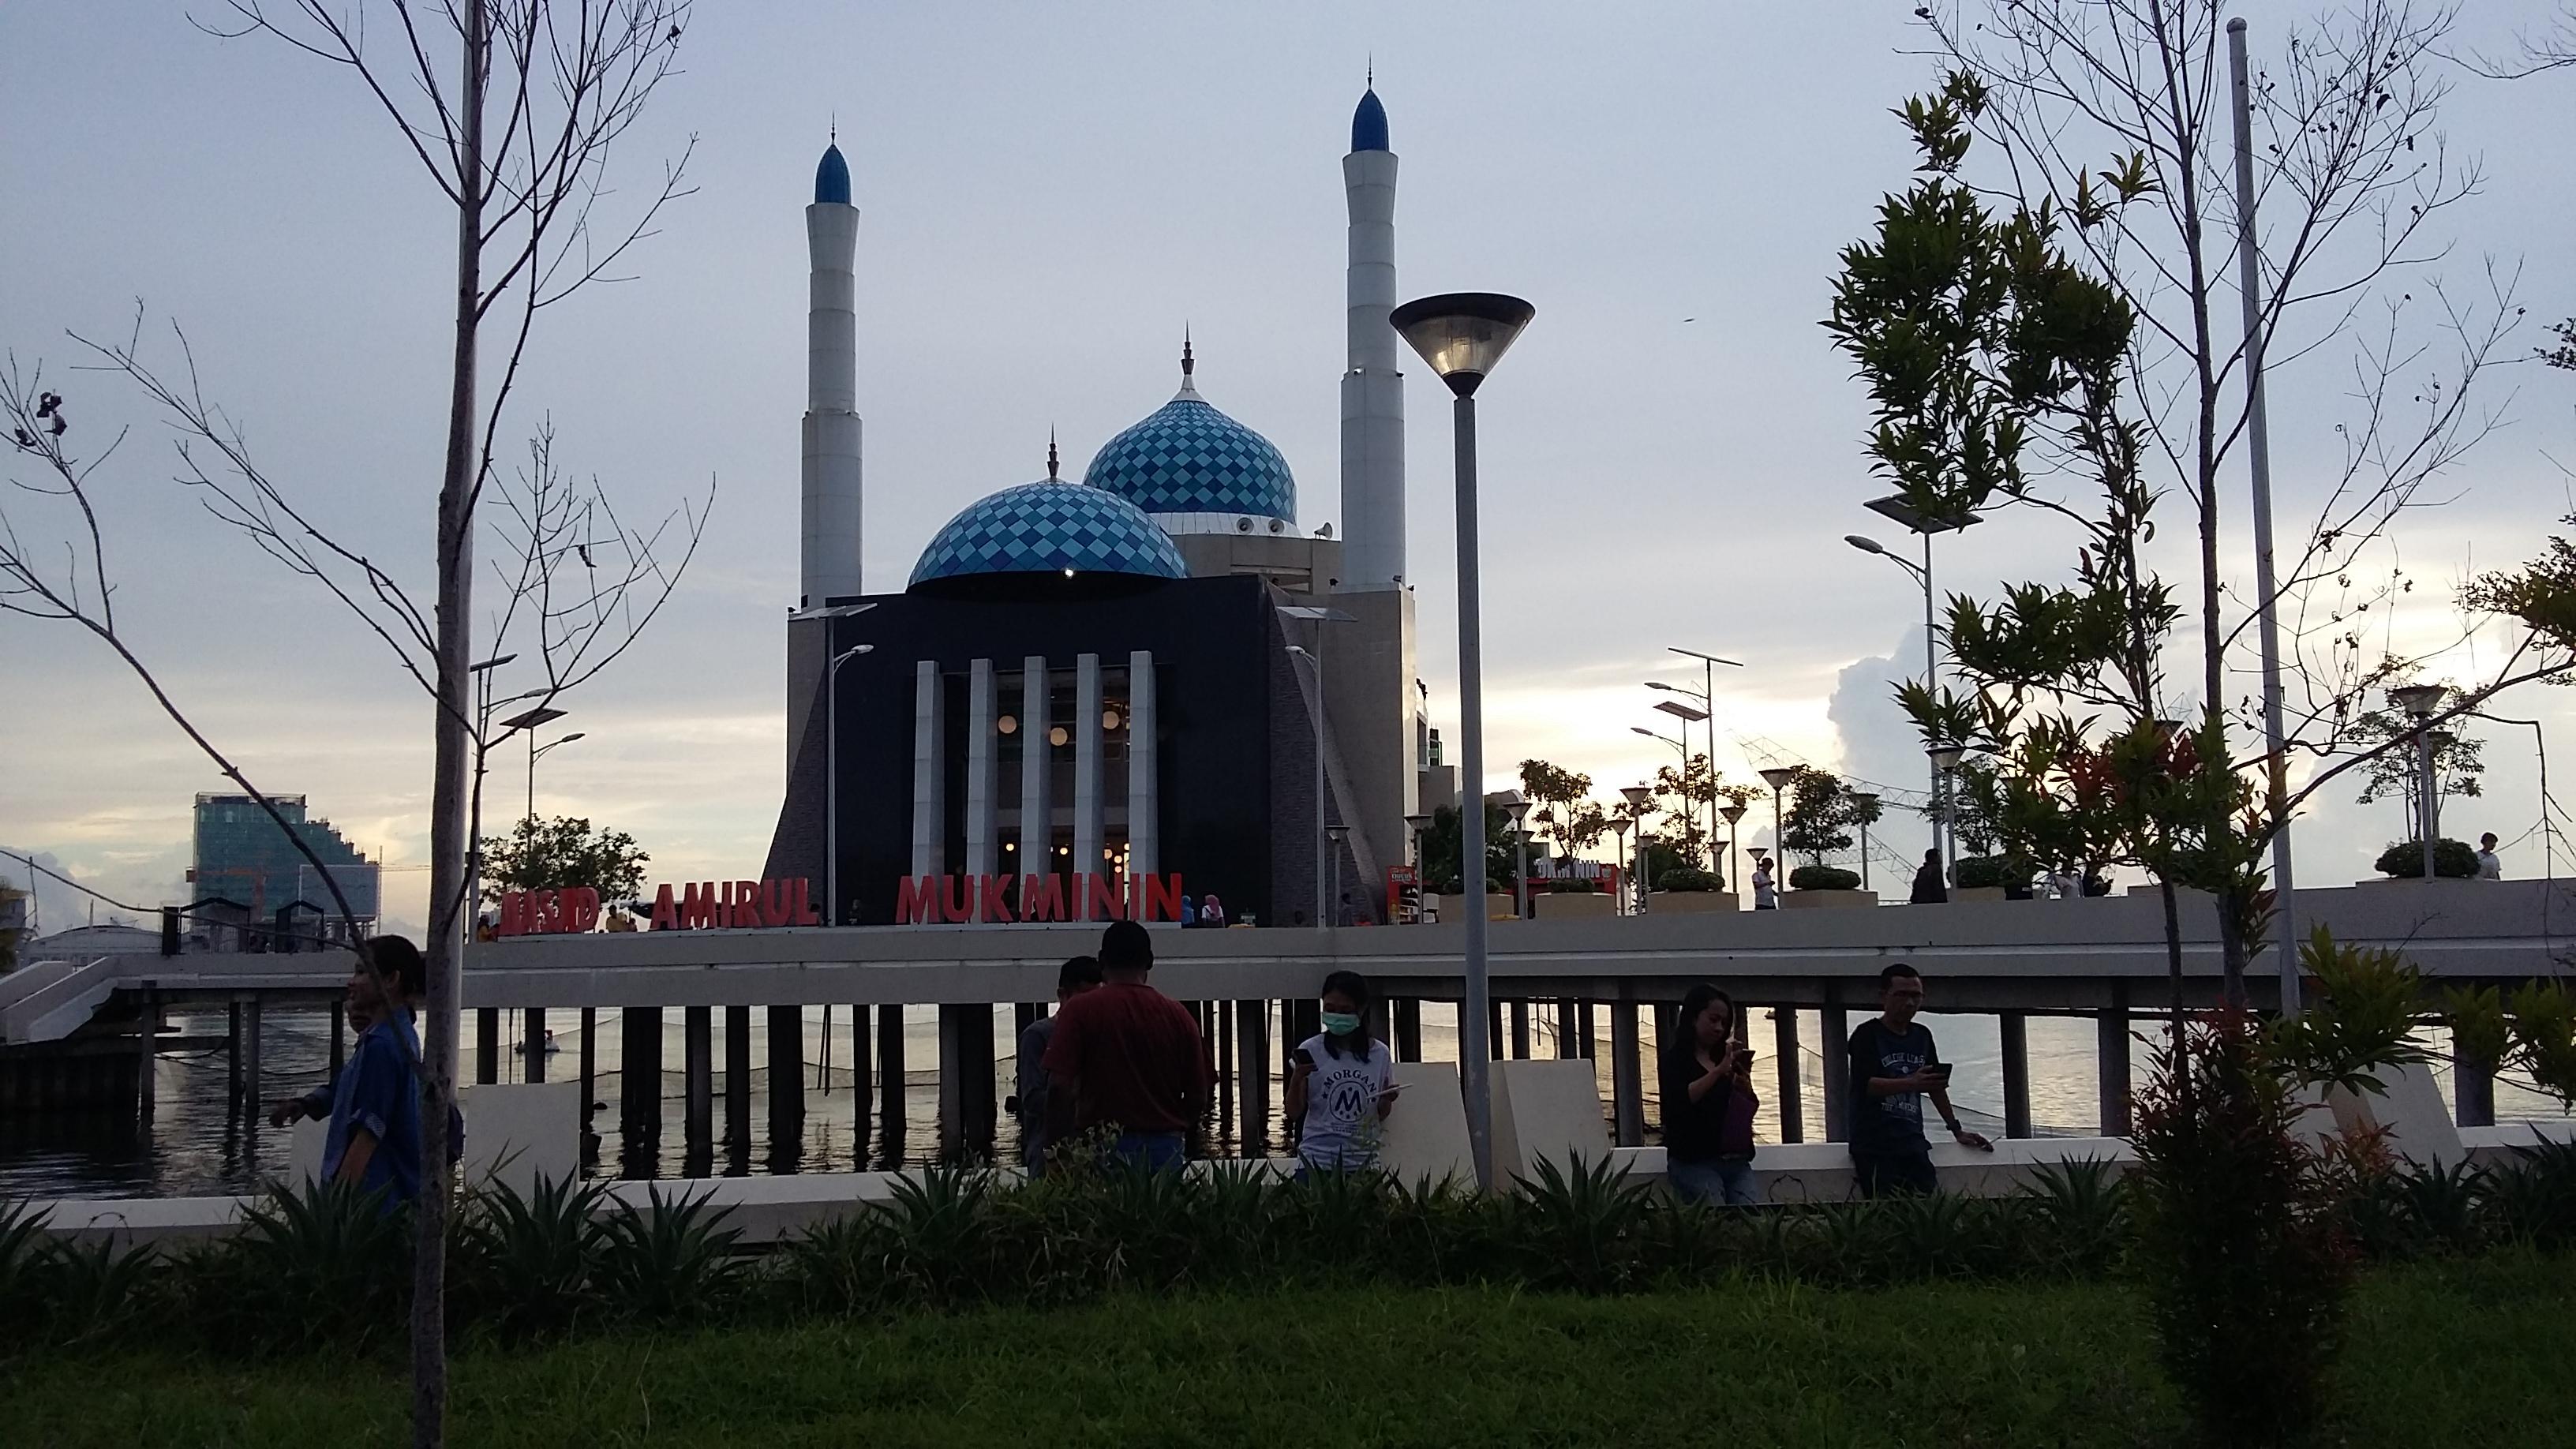 File Masjid Amirul Mukminin 4 Jpg Wikimedia Commons Kota Makassar